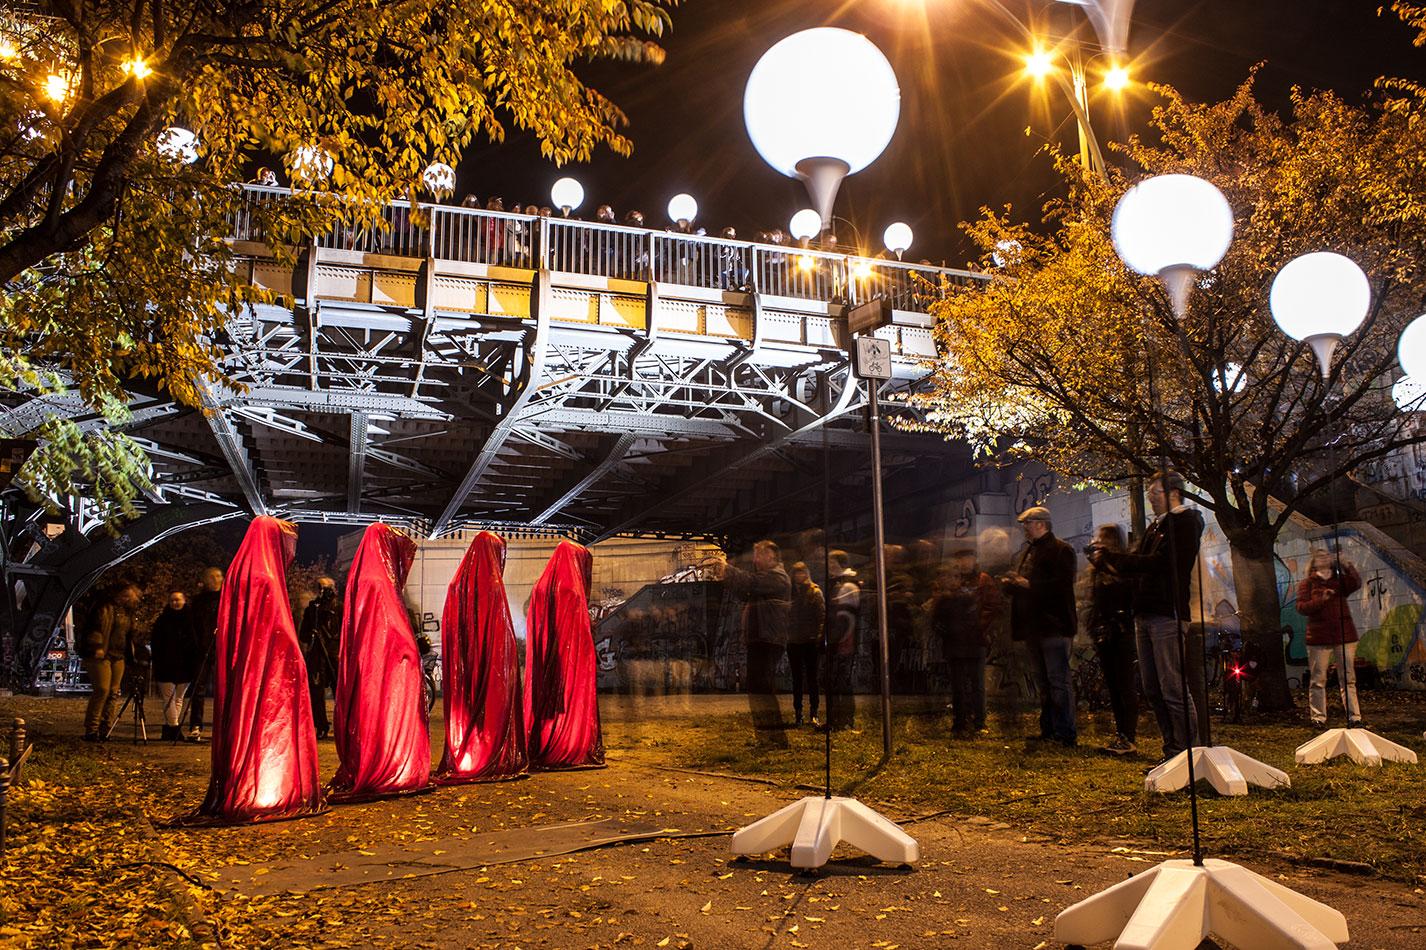 25-jears-wallfall-berlin-germany-contemporary-fine-art-show-arts-design-guardians-of-time-manfred-kili-kielnhofer-4300